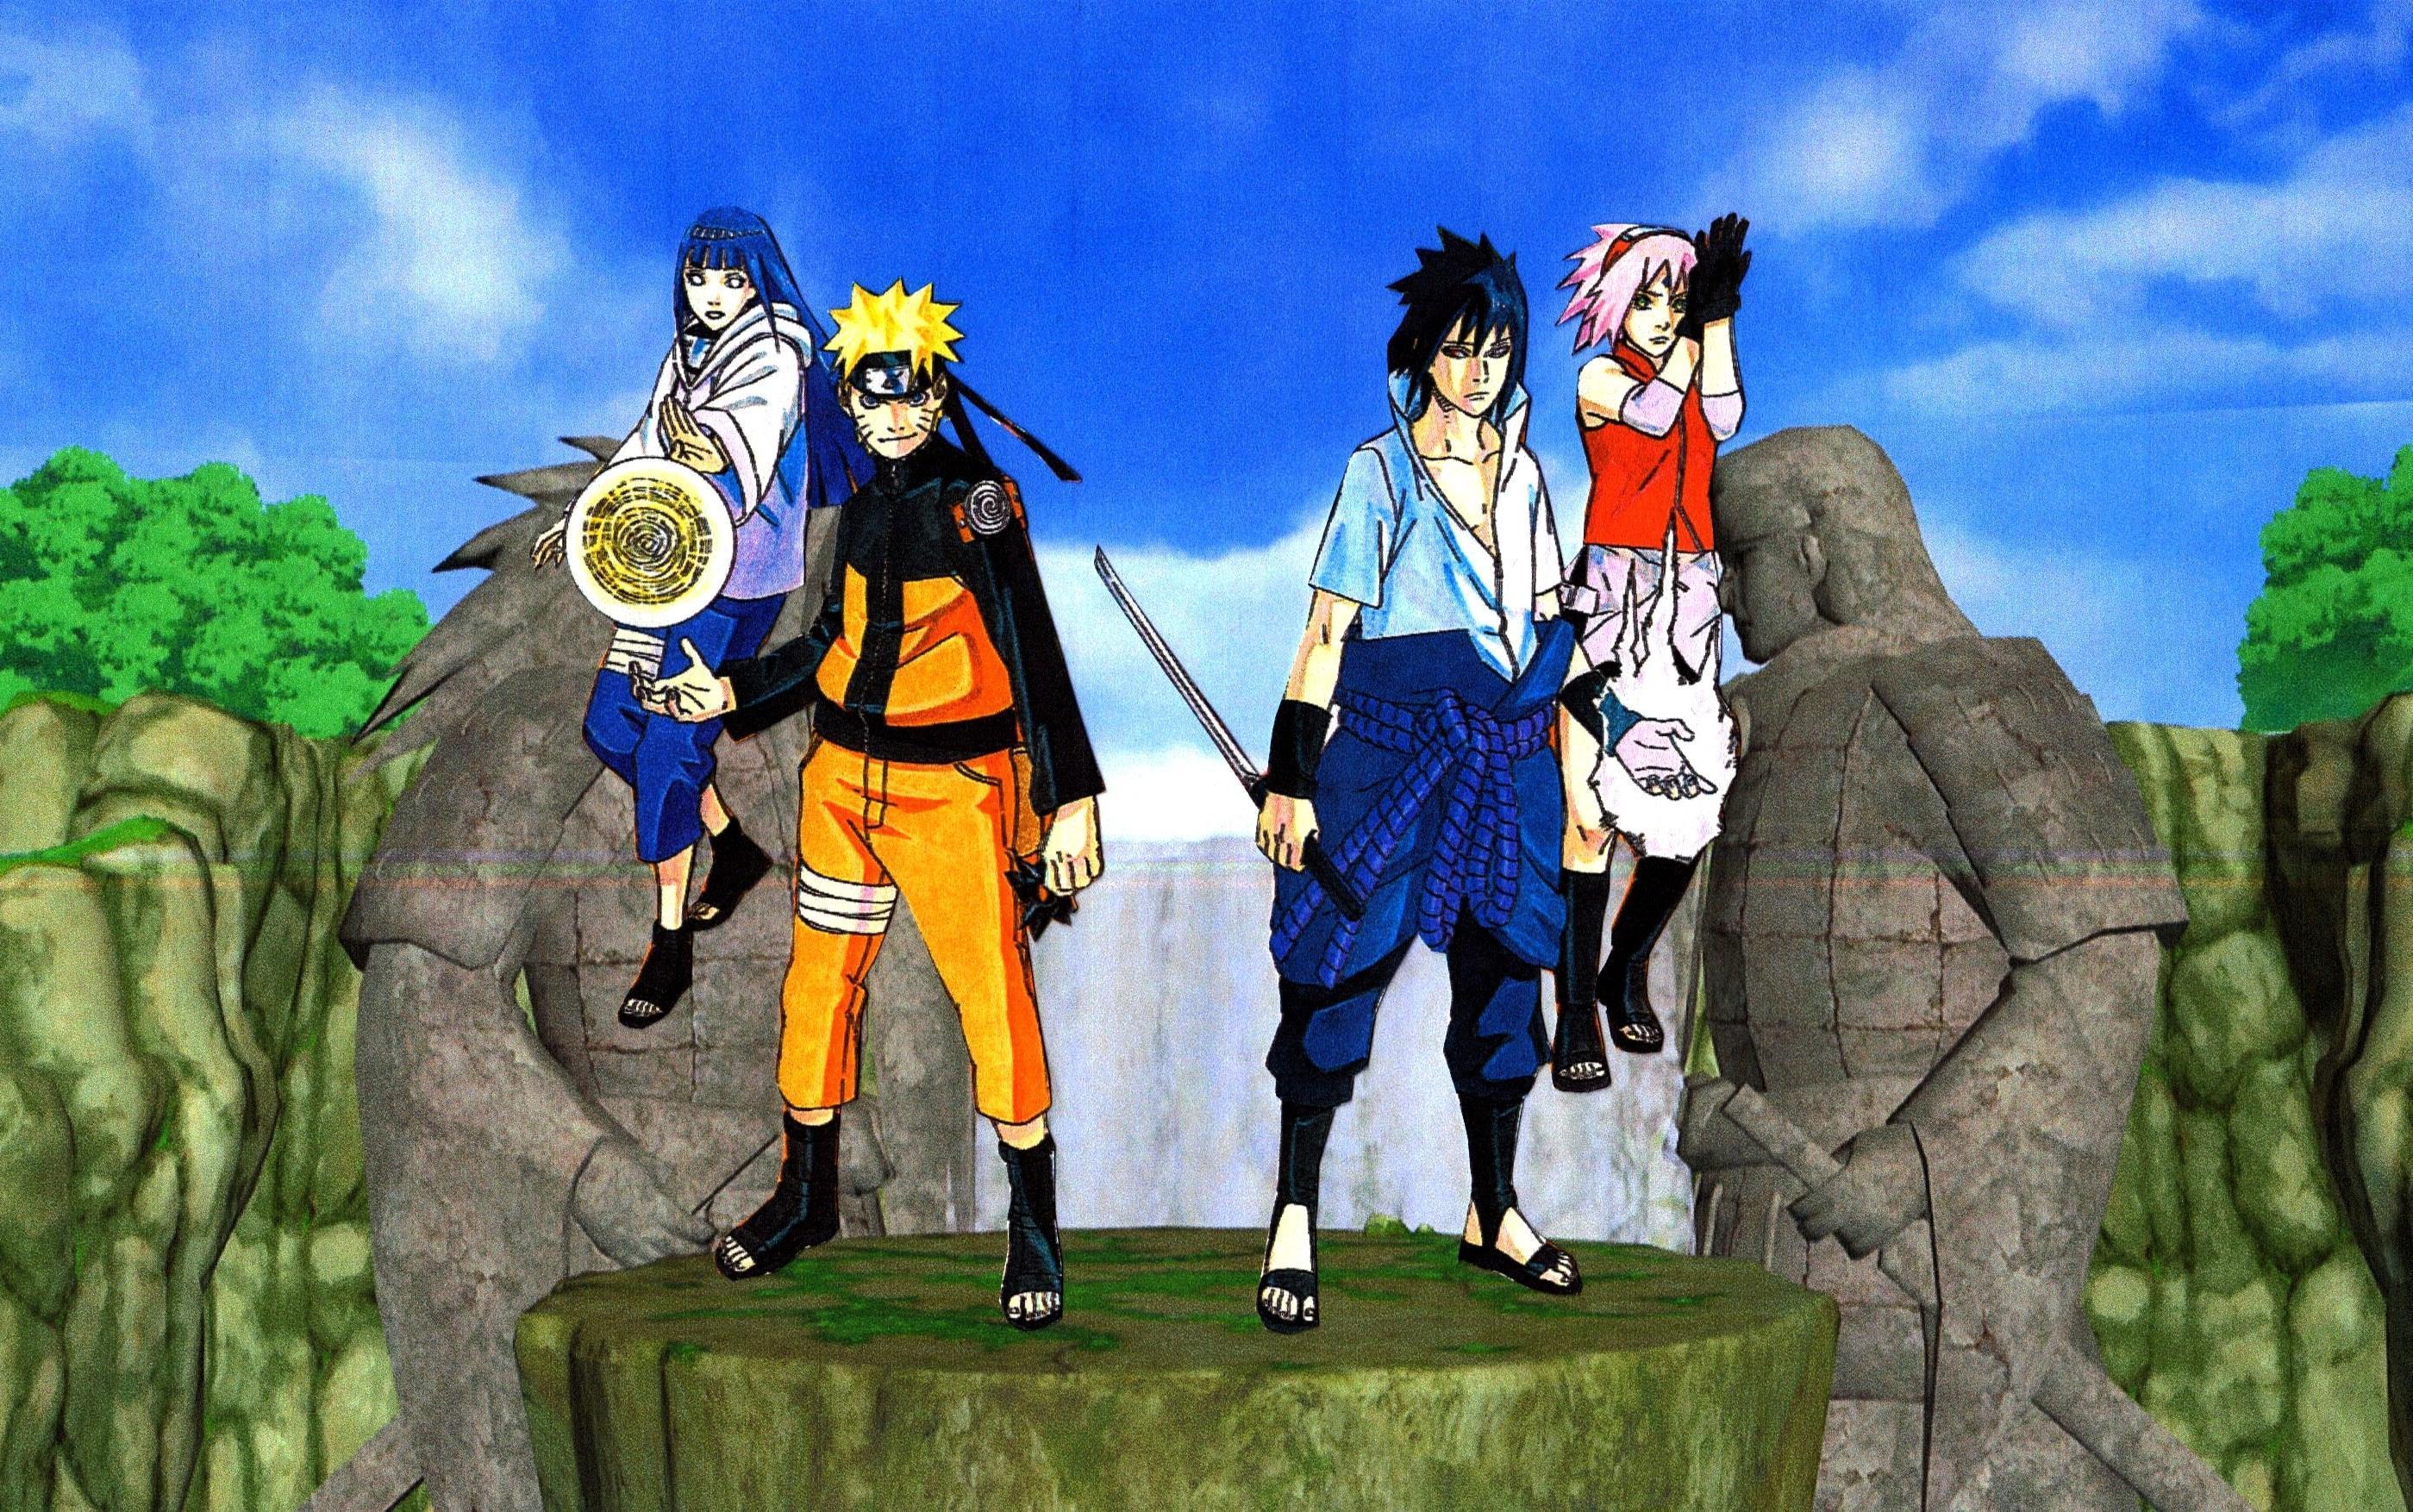 Naruto Hinata Sasuke Sakura Wallpaper 2 By Weissdrum On Deviantart